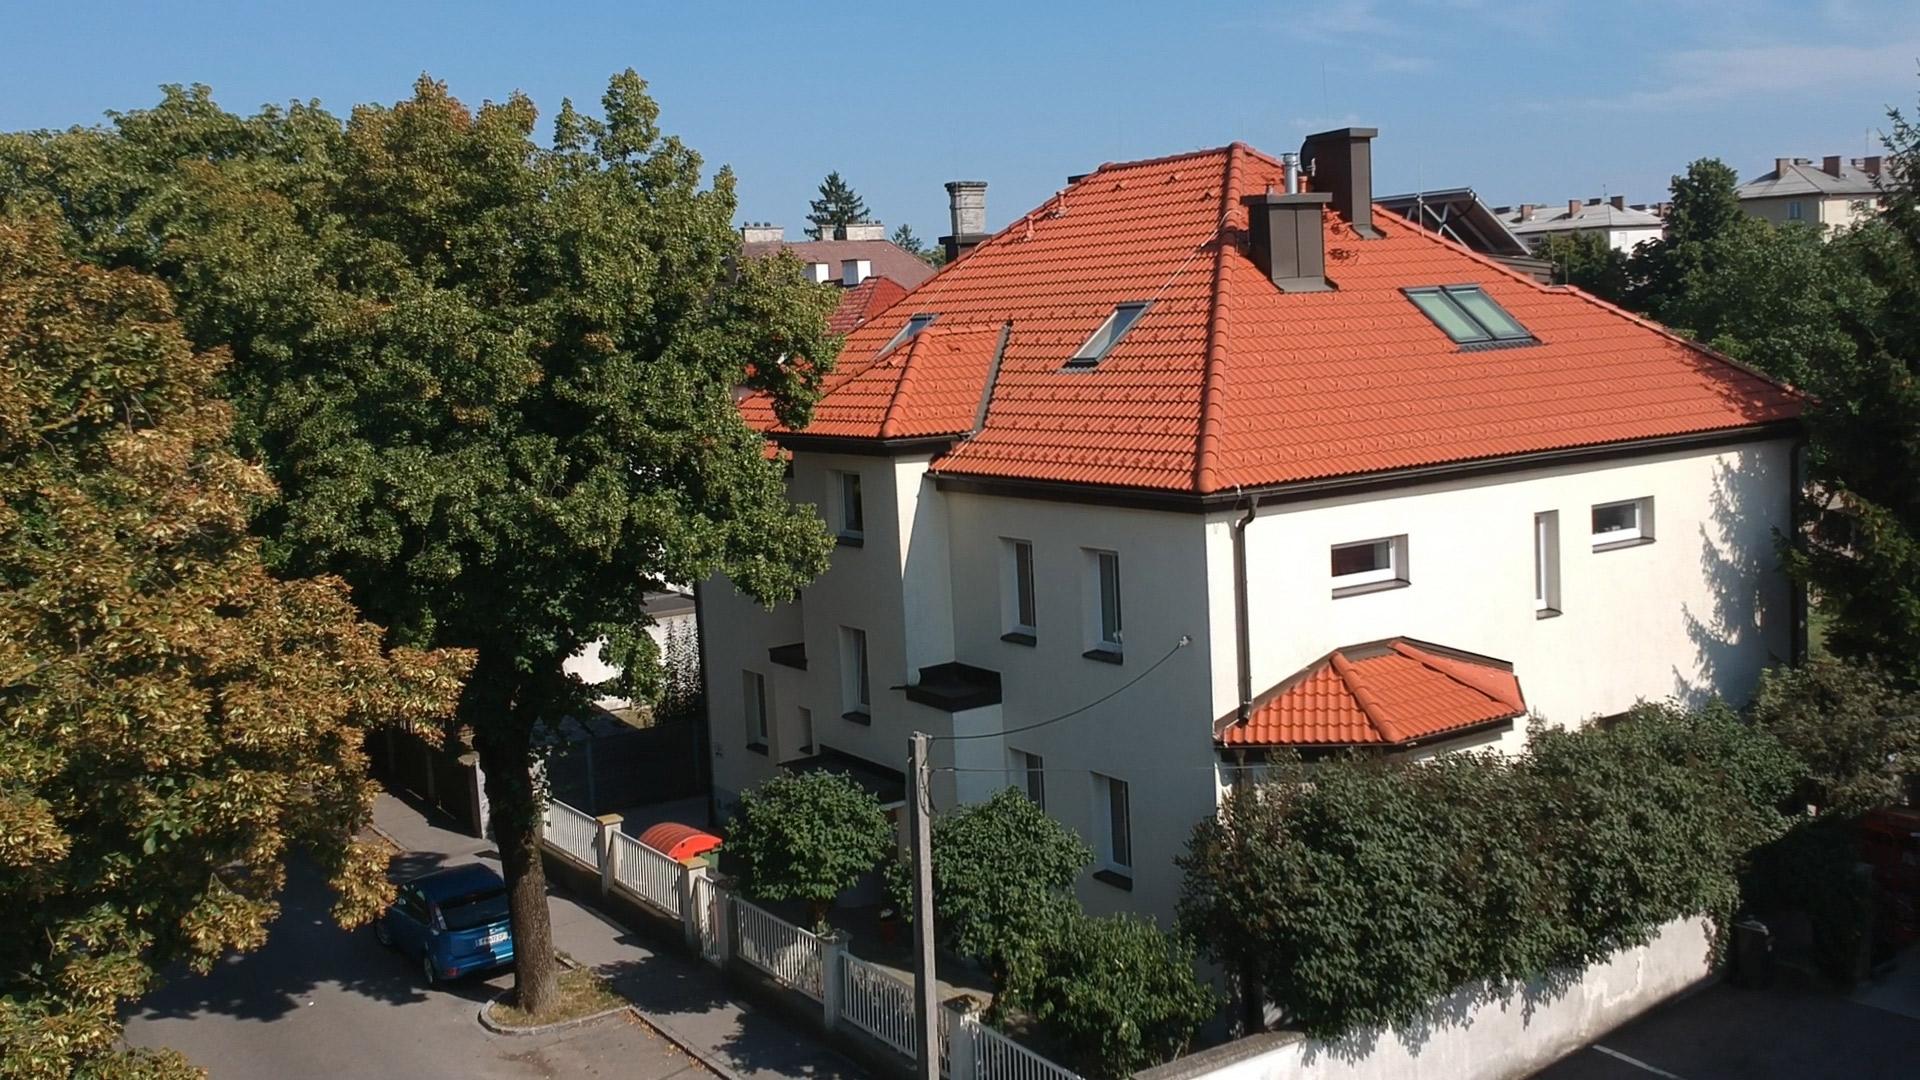 3100 St.Pölten, Dr. Theodor-Körner-Straße 31